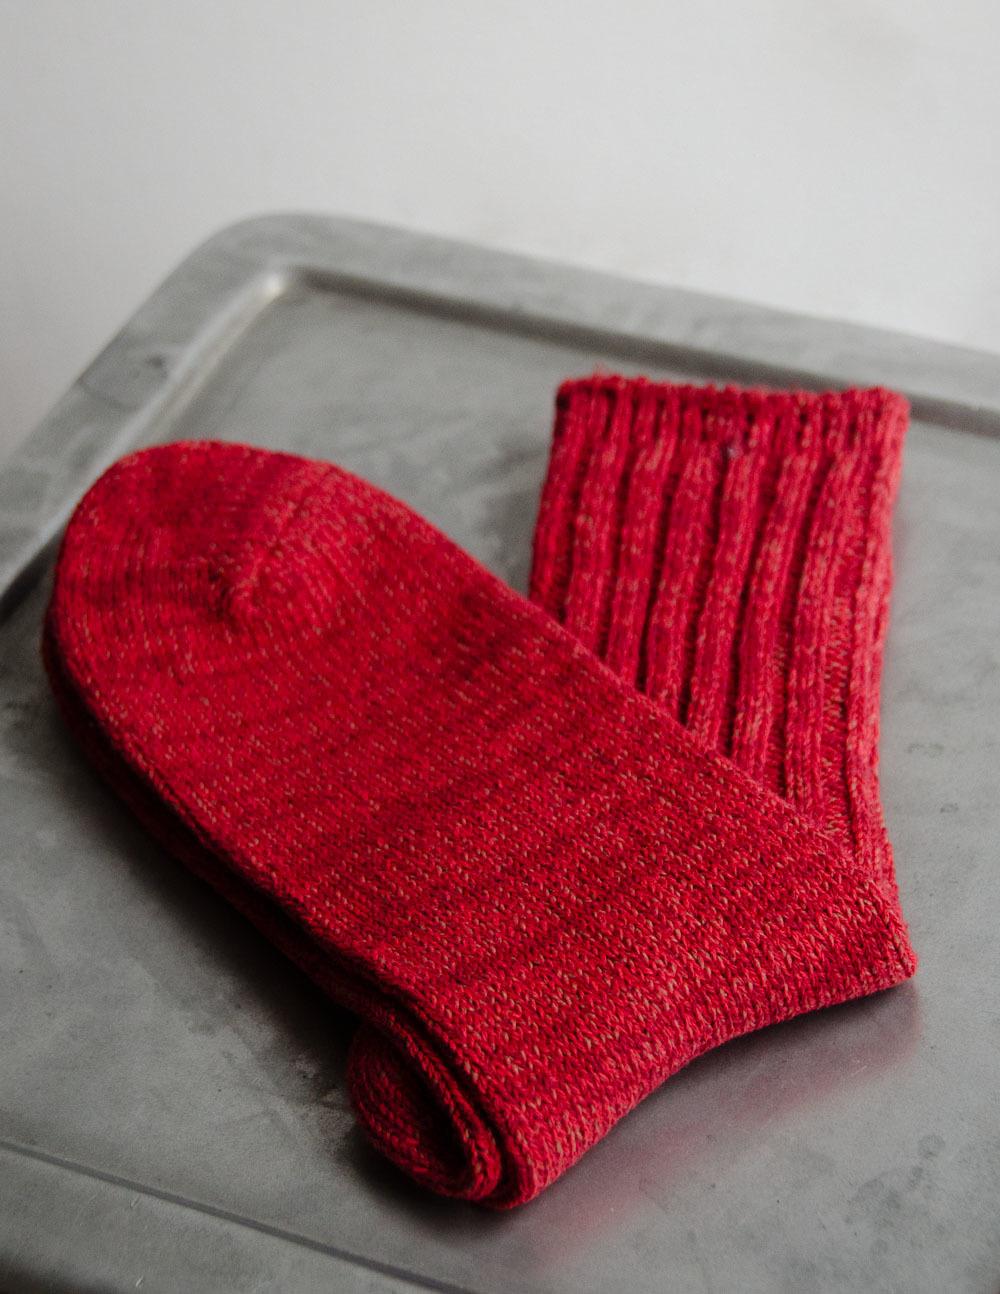 socks-premium-picks-5.jpg